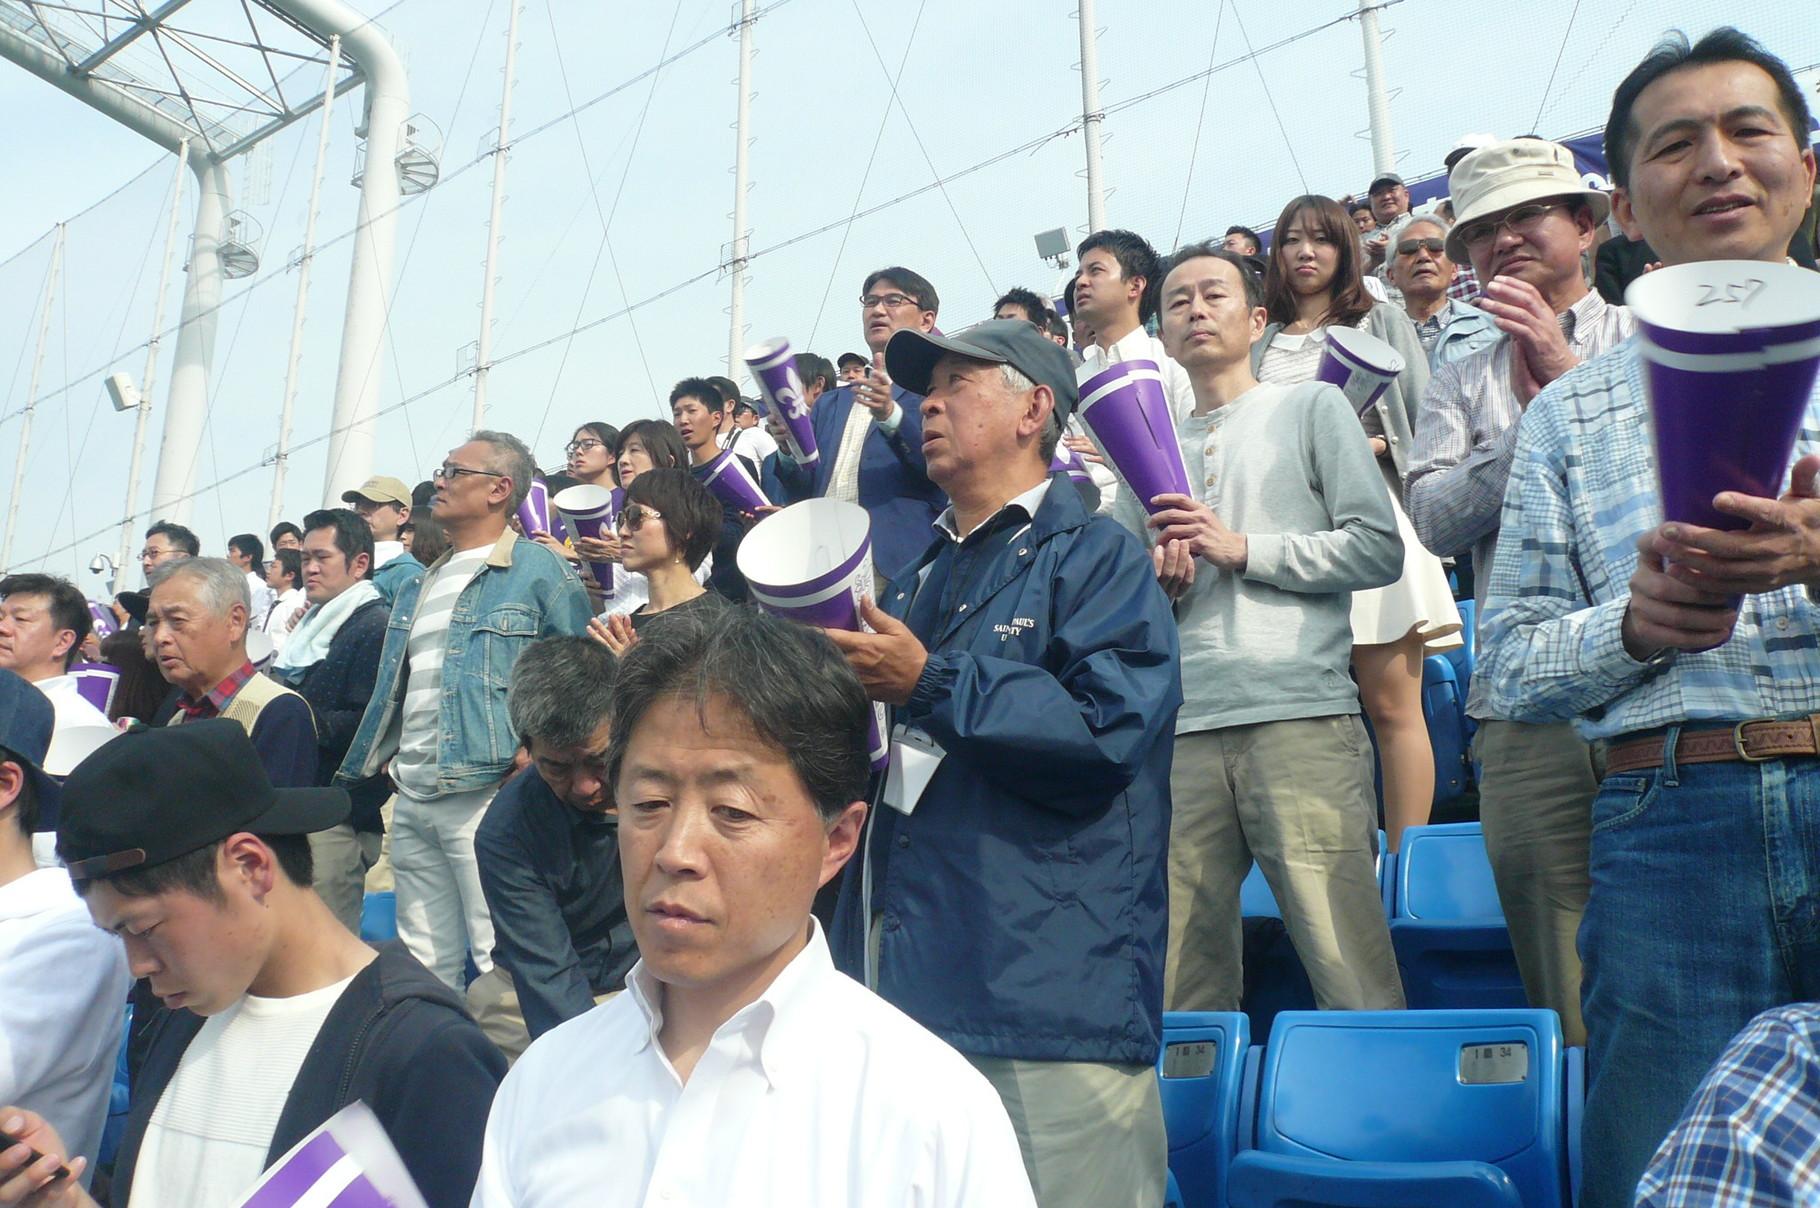 湘南立教会応援メンバー